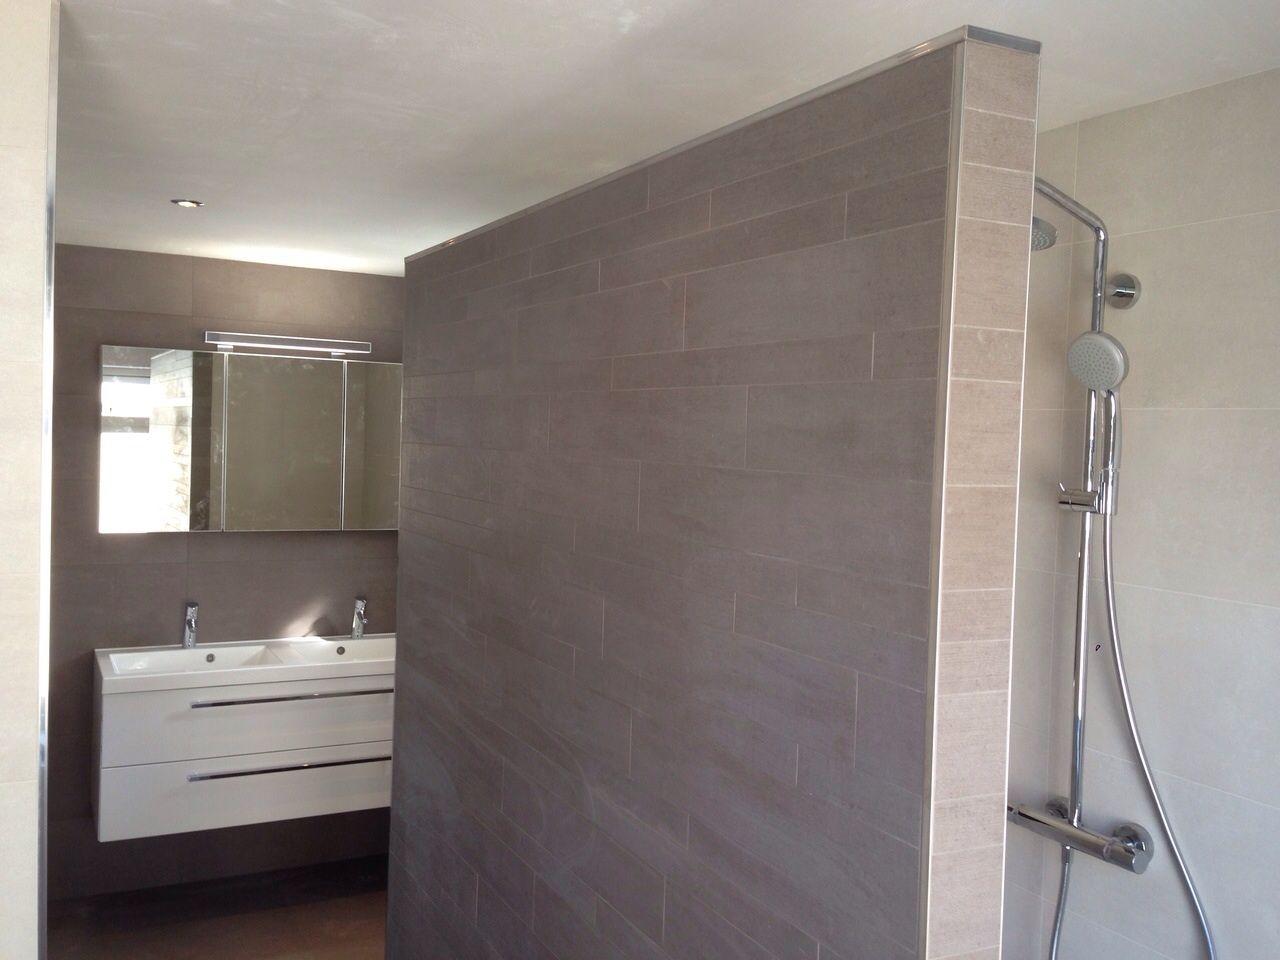 Wildverband Tegels Badkamer : Badkamer met wildverband tegels en stucplafond. gerealiseerd door